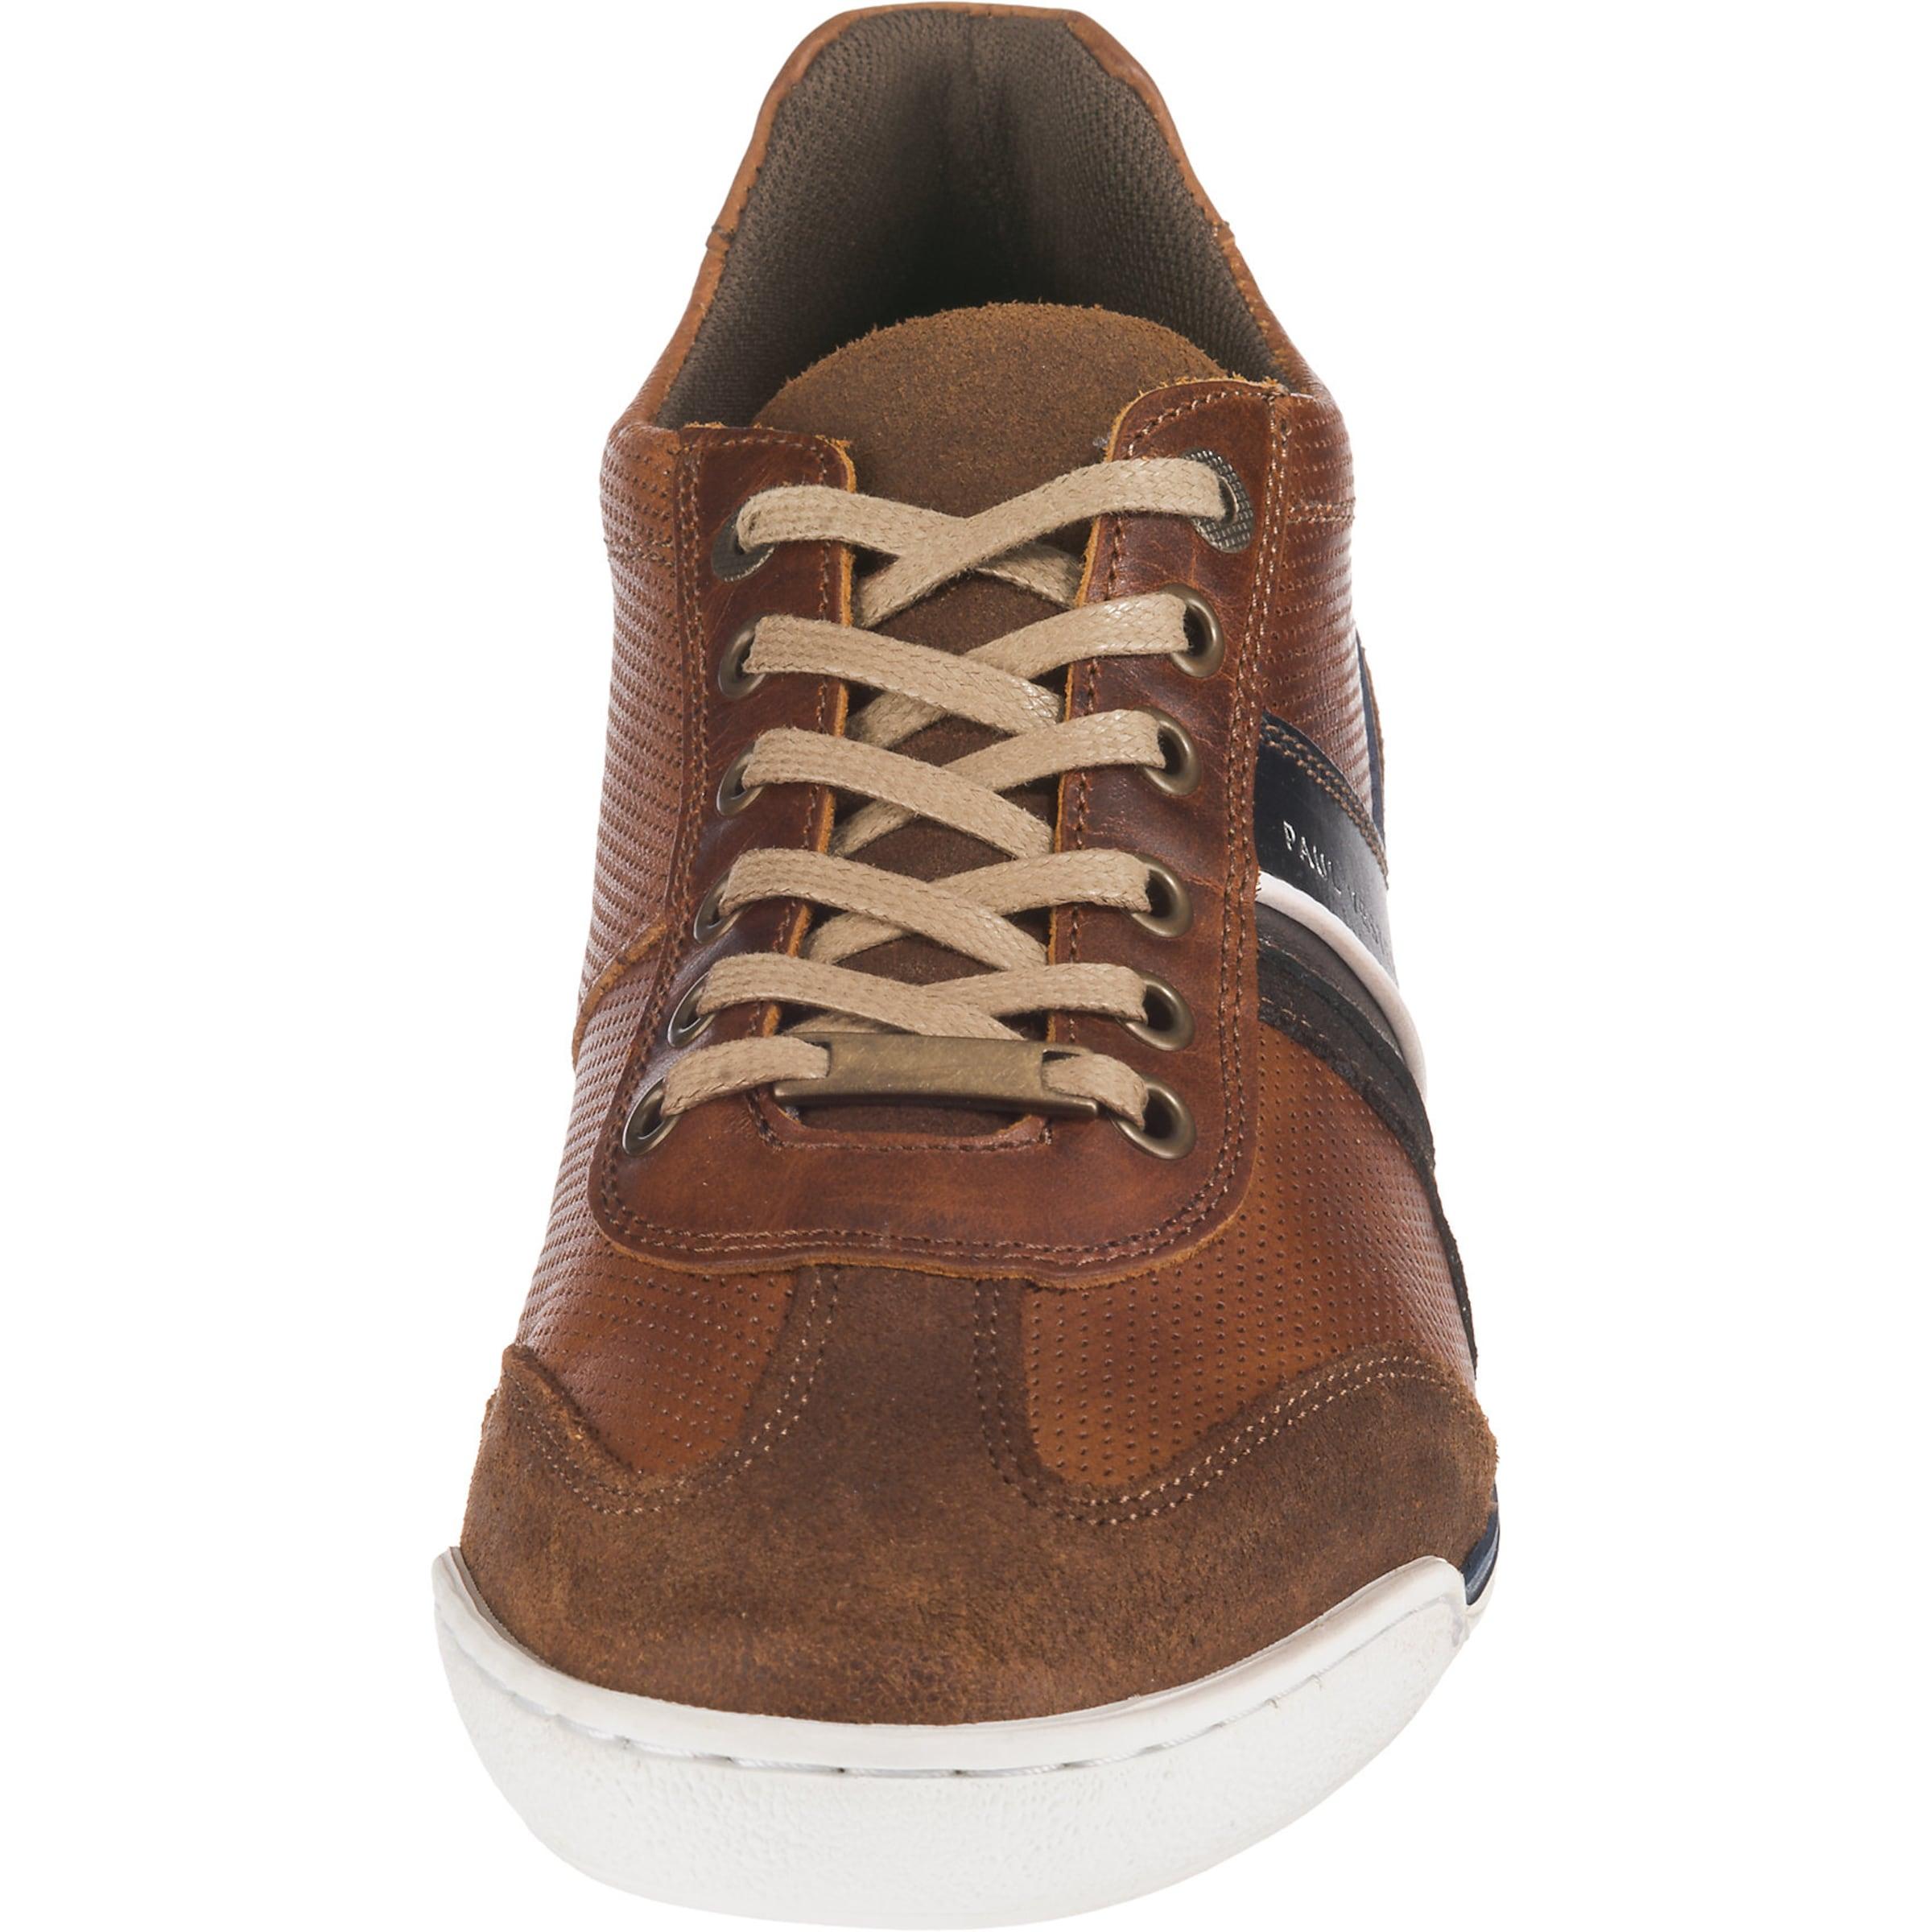 Sneakers Vesterbro Paul Braun Leder In PNnOX80wk